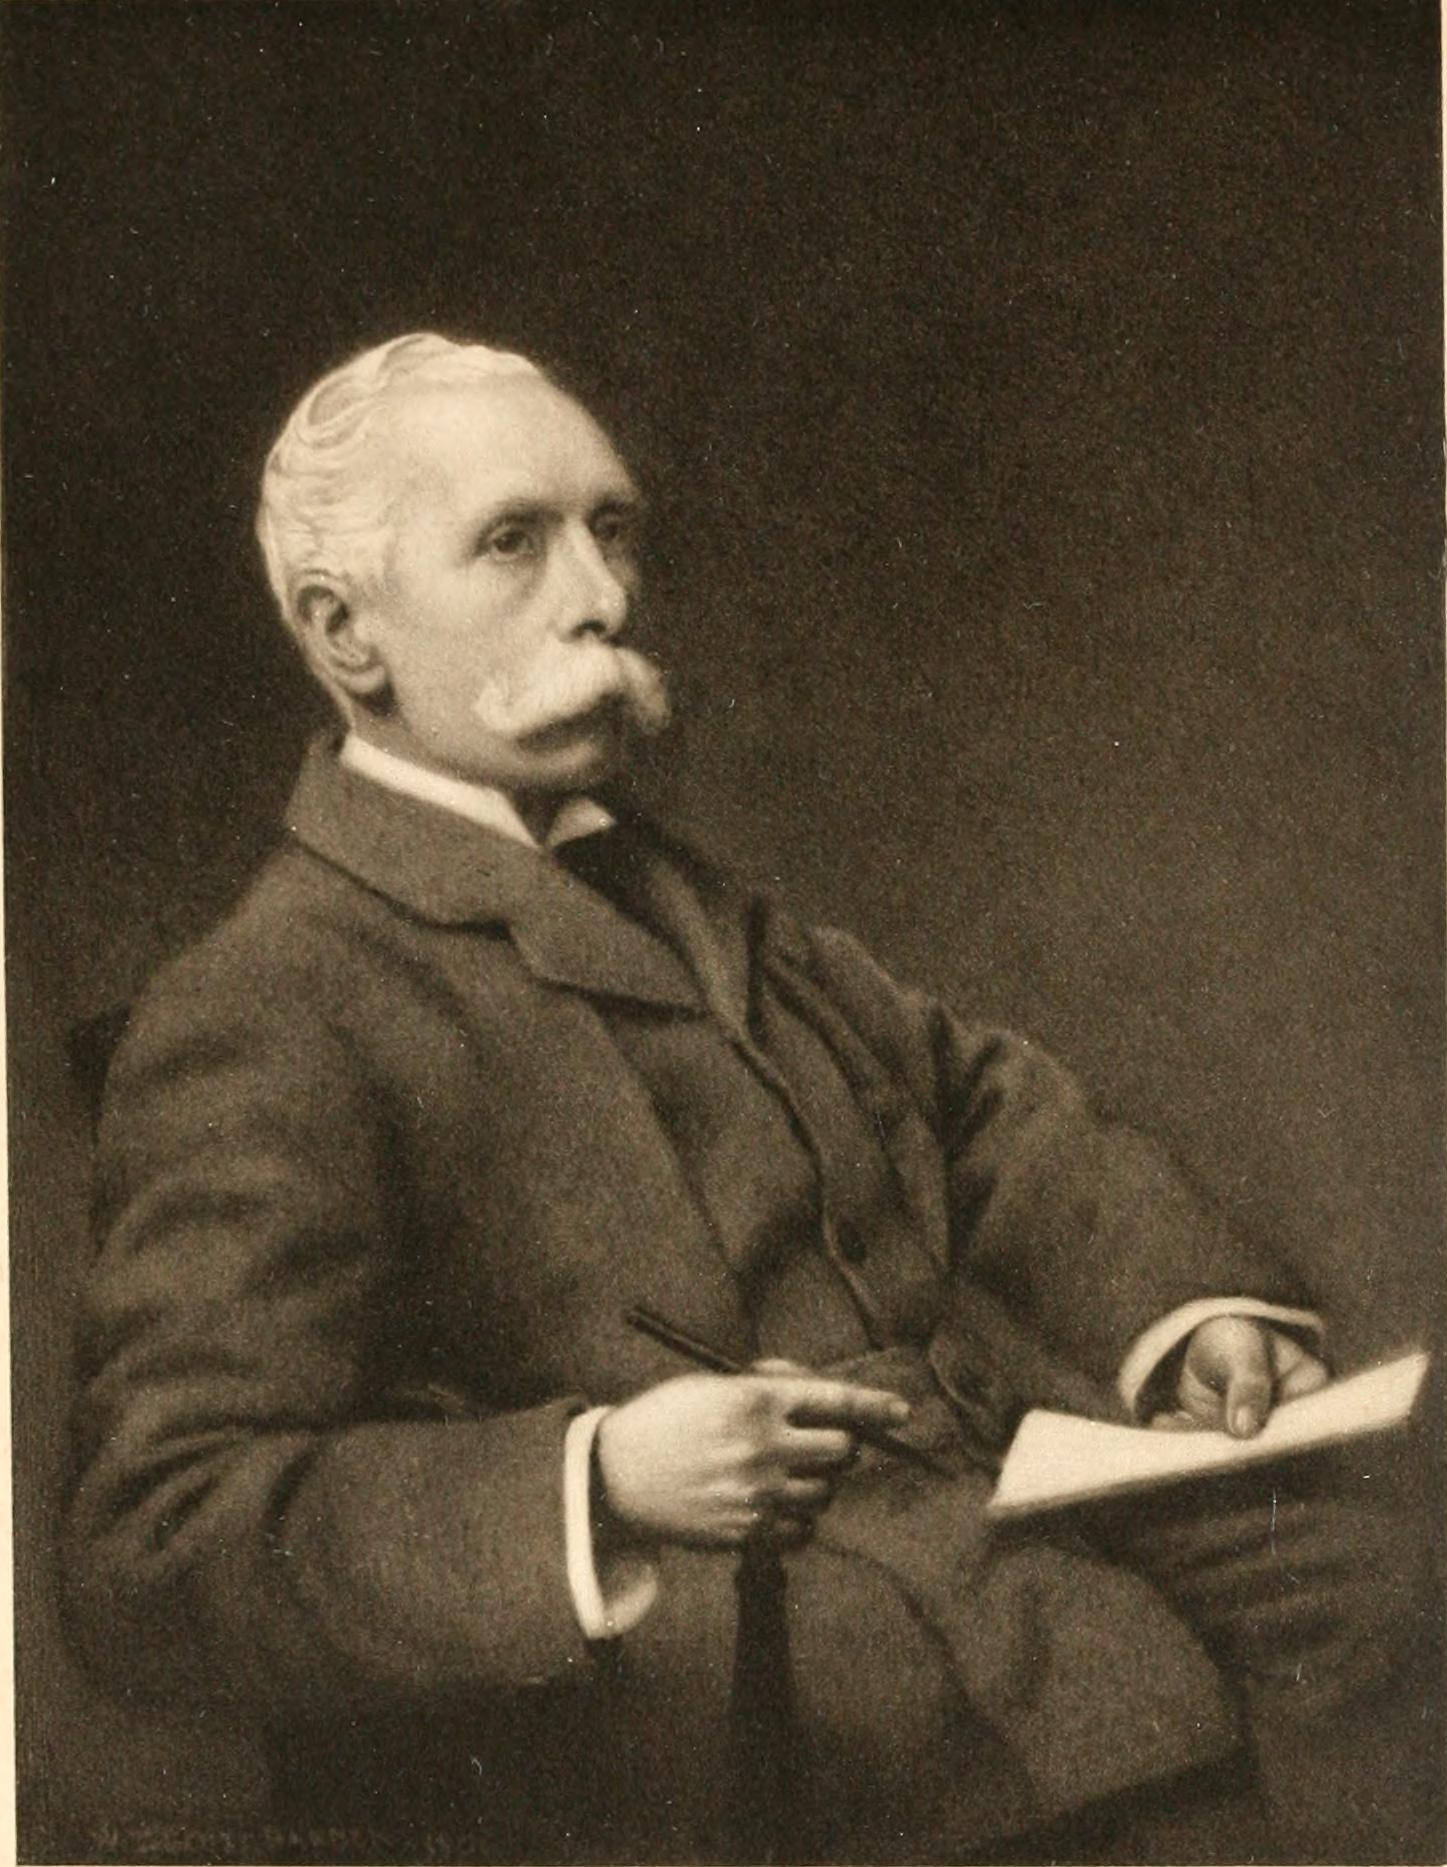 Barber Austin : File:Alfred Austin, by Barber.jpg - Wikimedia Commons